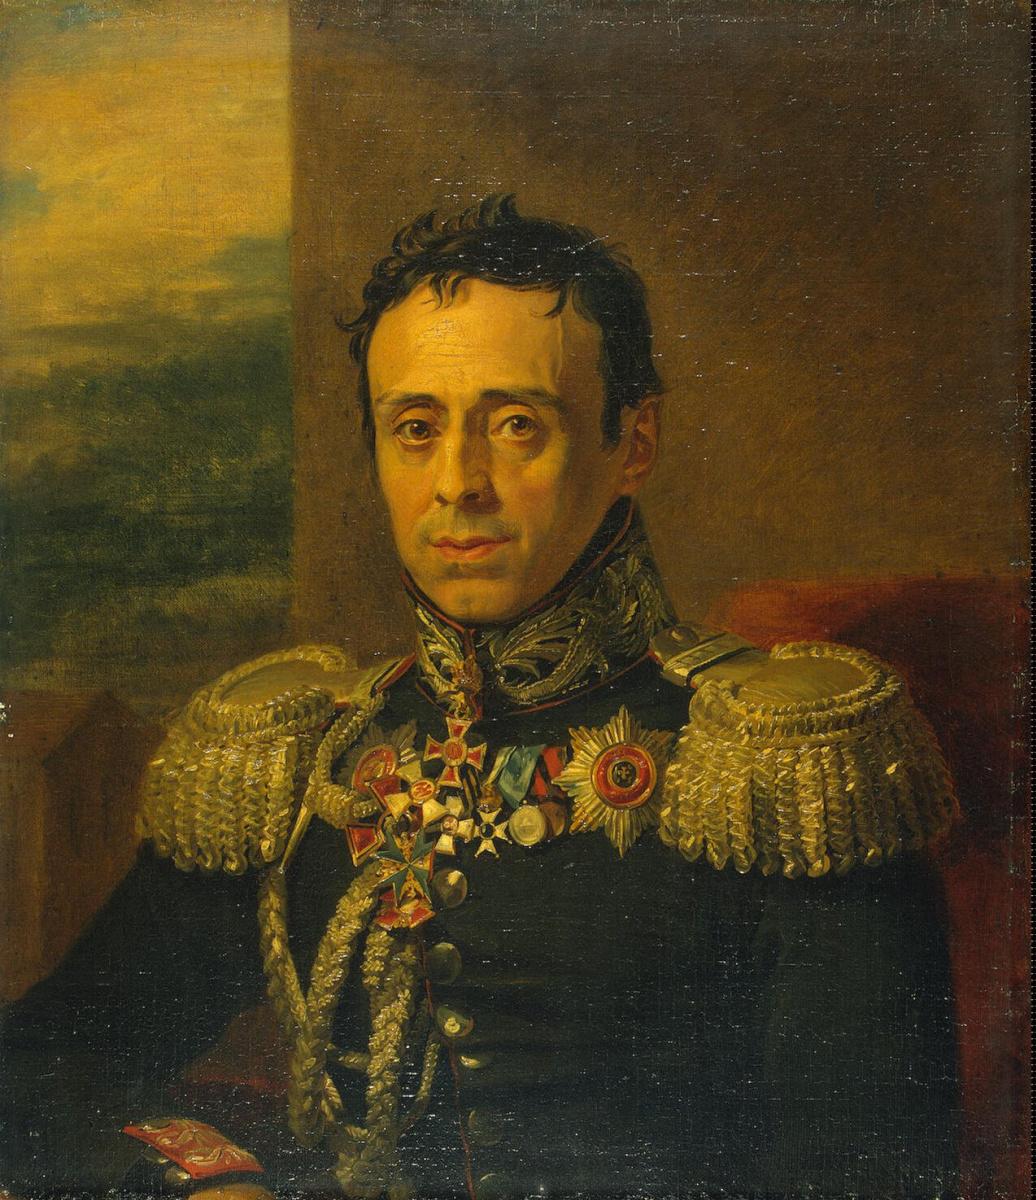 Джордж Доу. Портрет Николая Ивановича Селявина